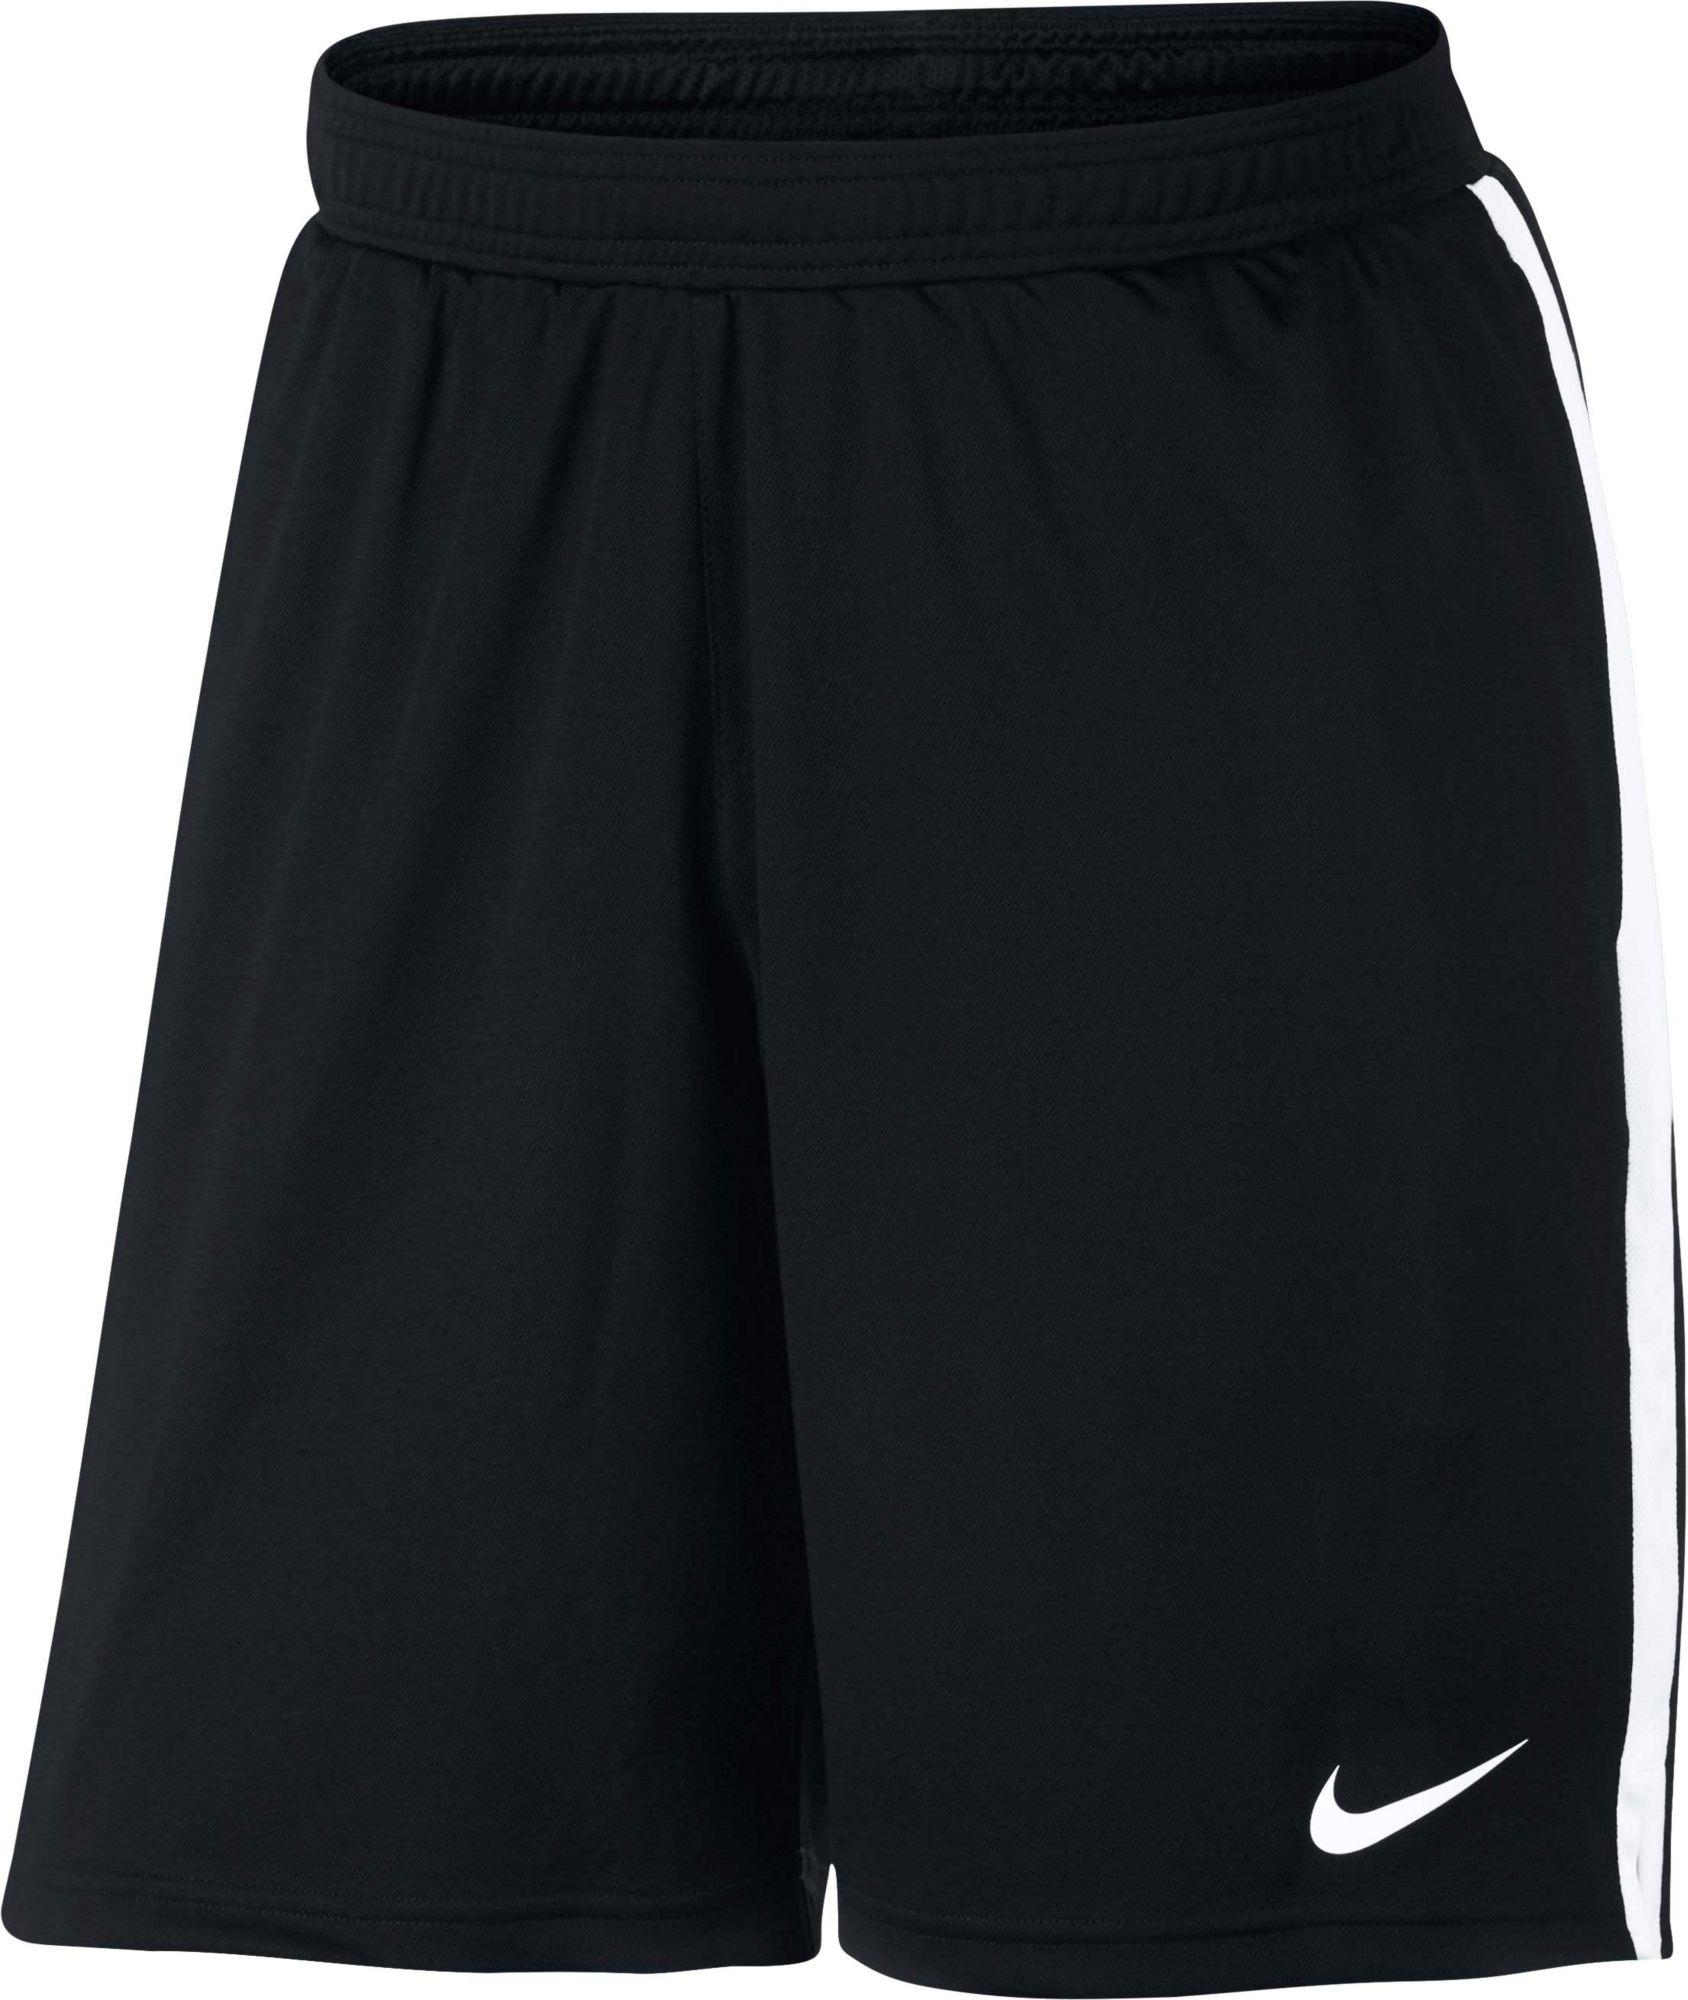 tennis shorts nike